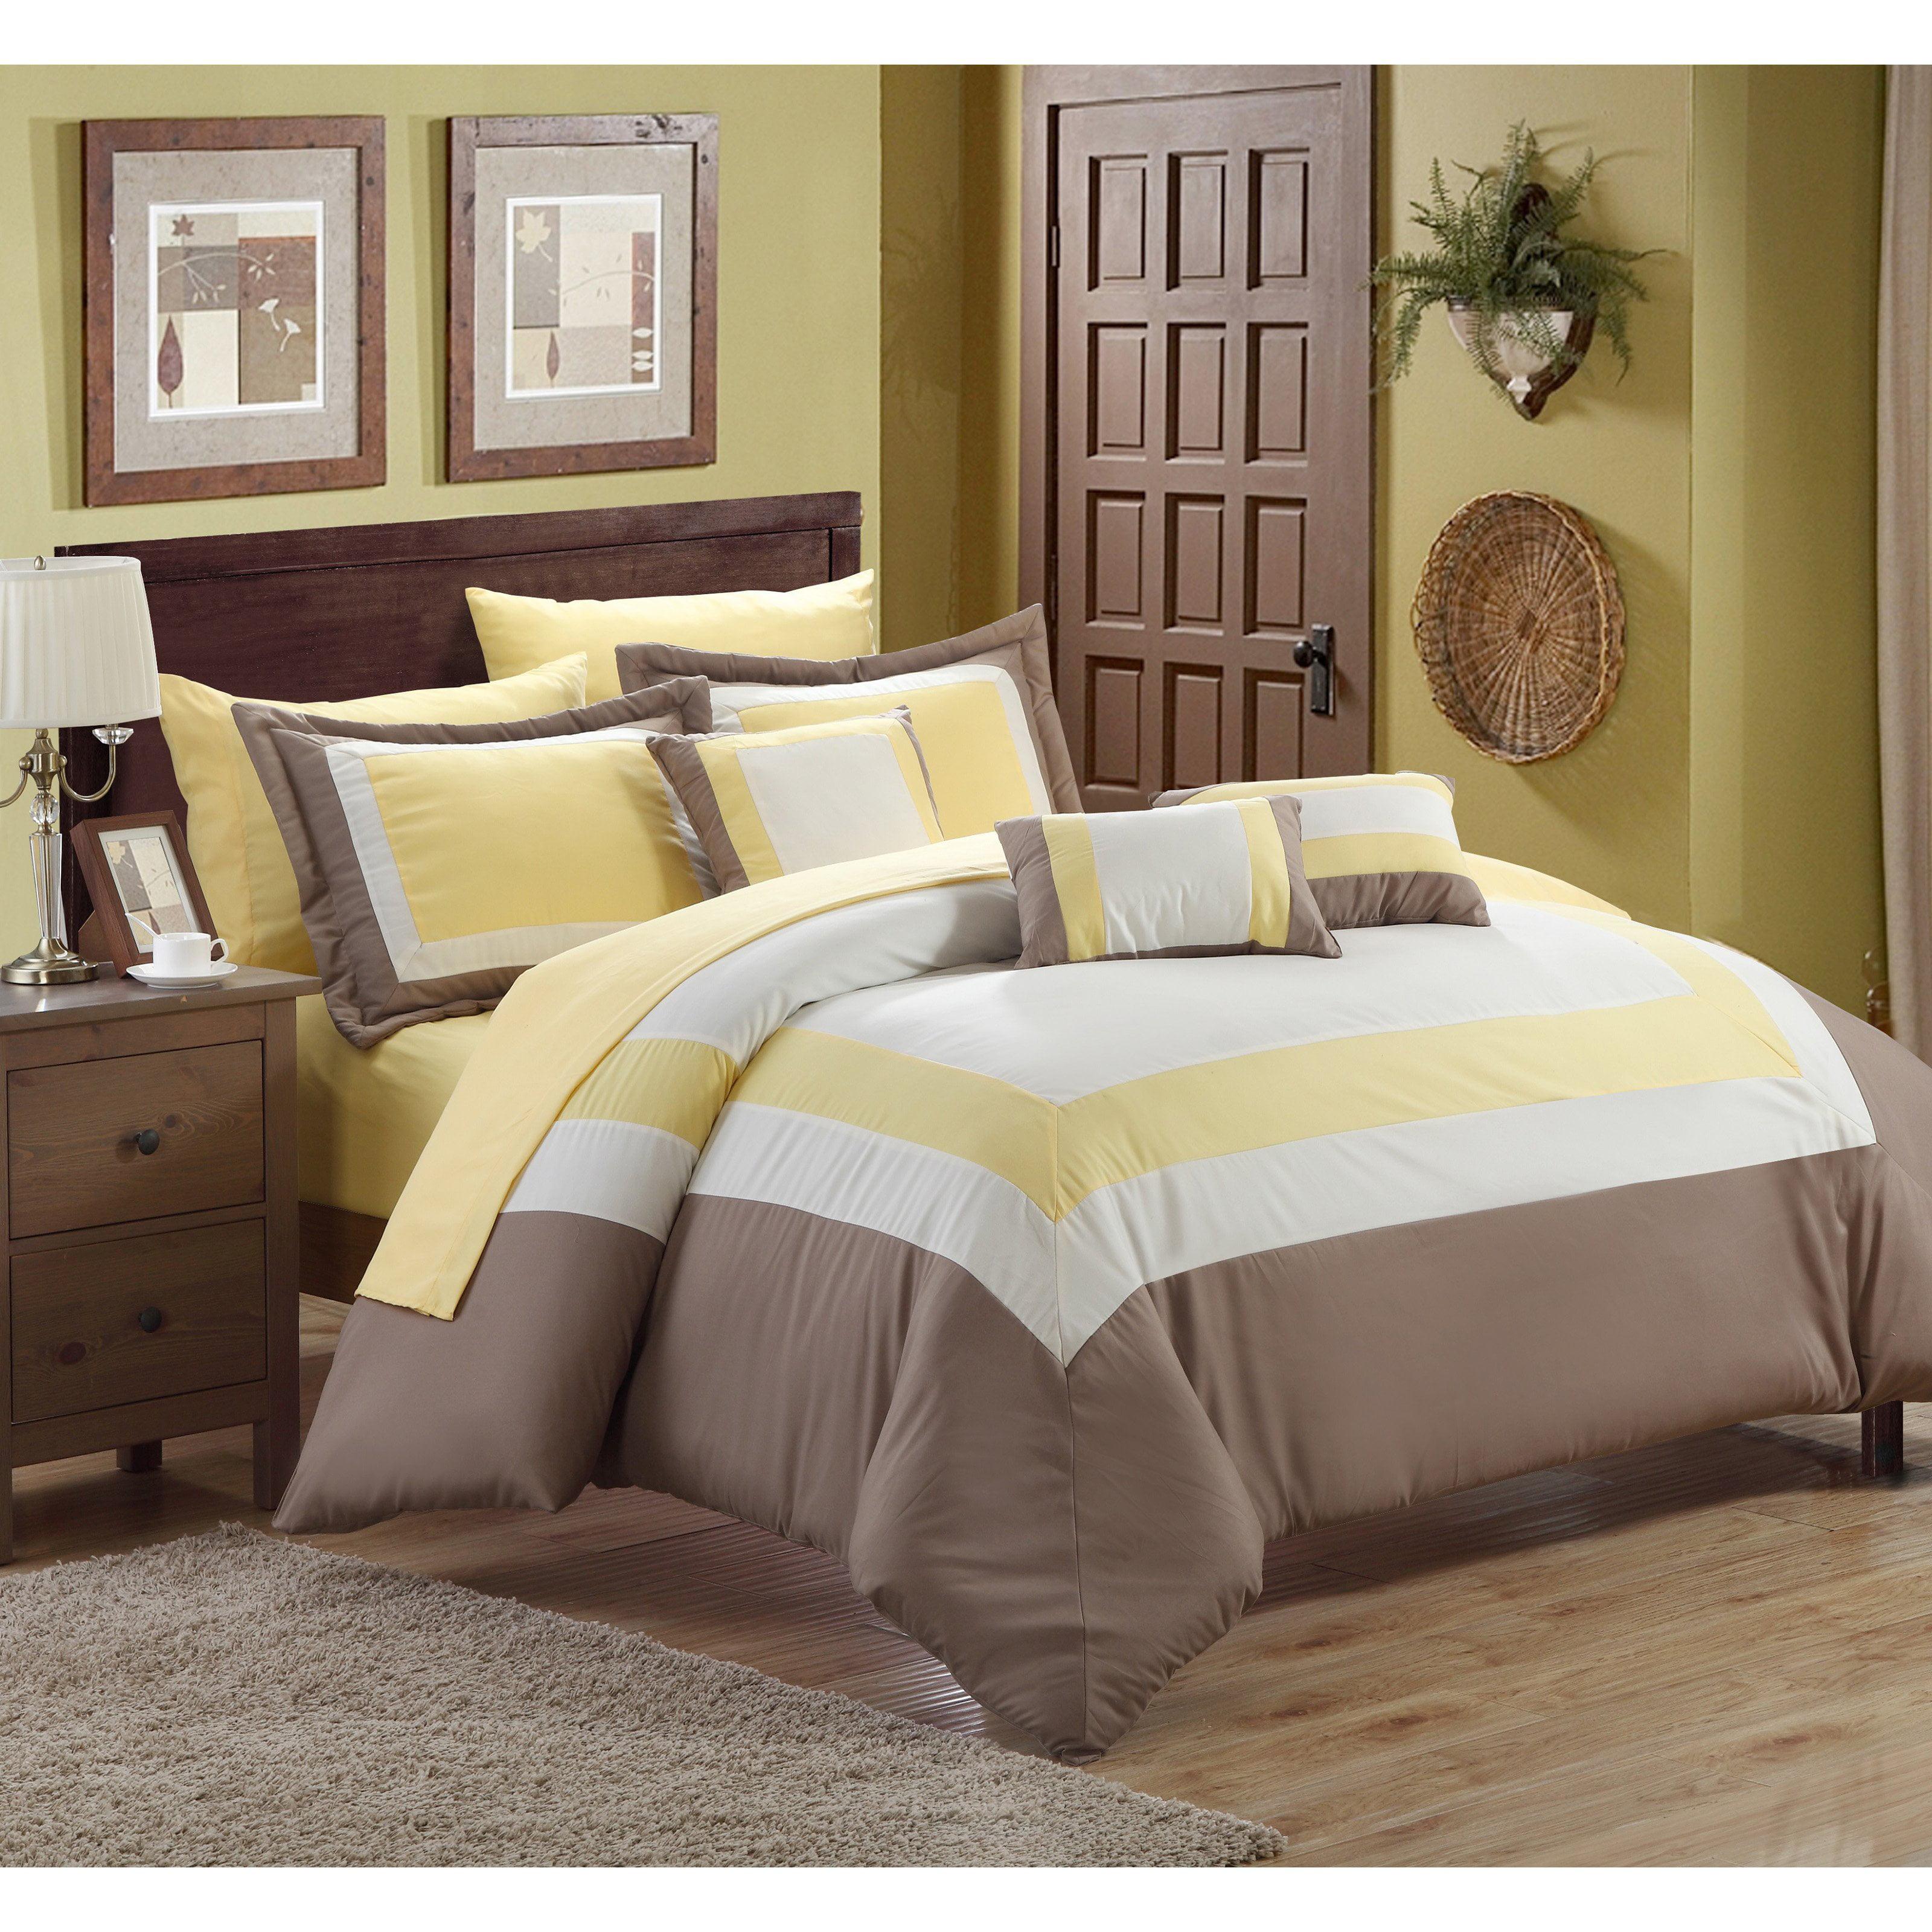 Chic Home Duke 10 Piece Bed in a Bag Comforter Set - Walmart.com